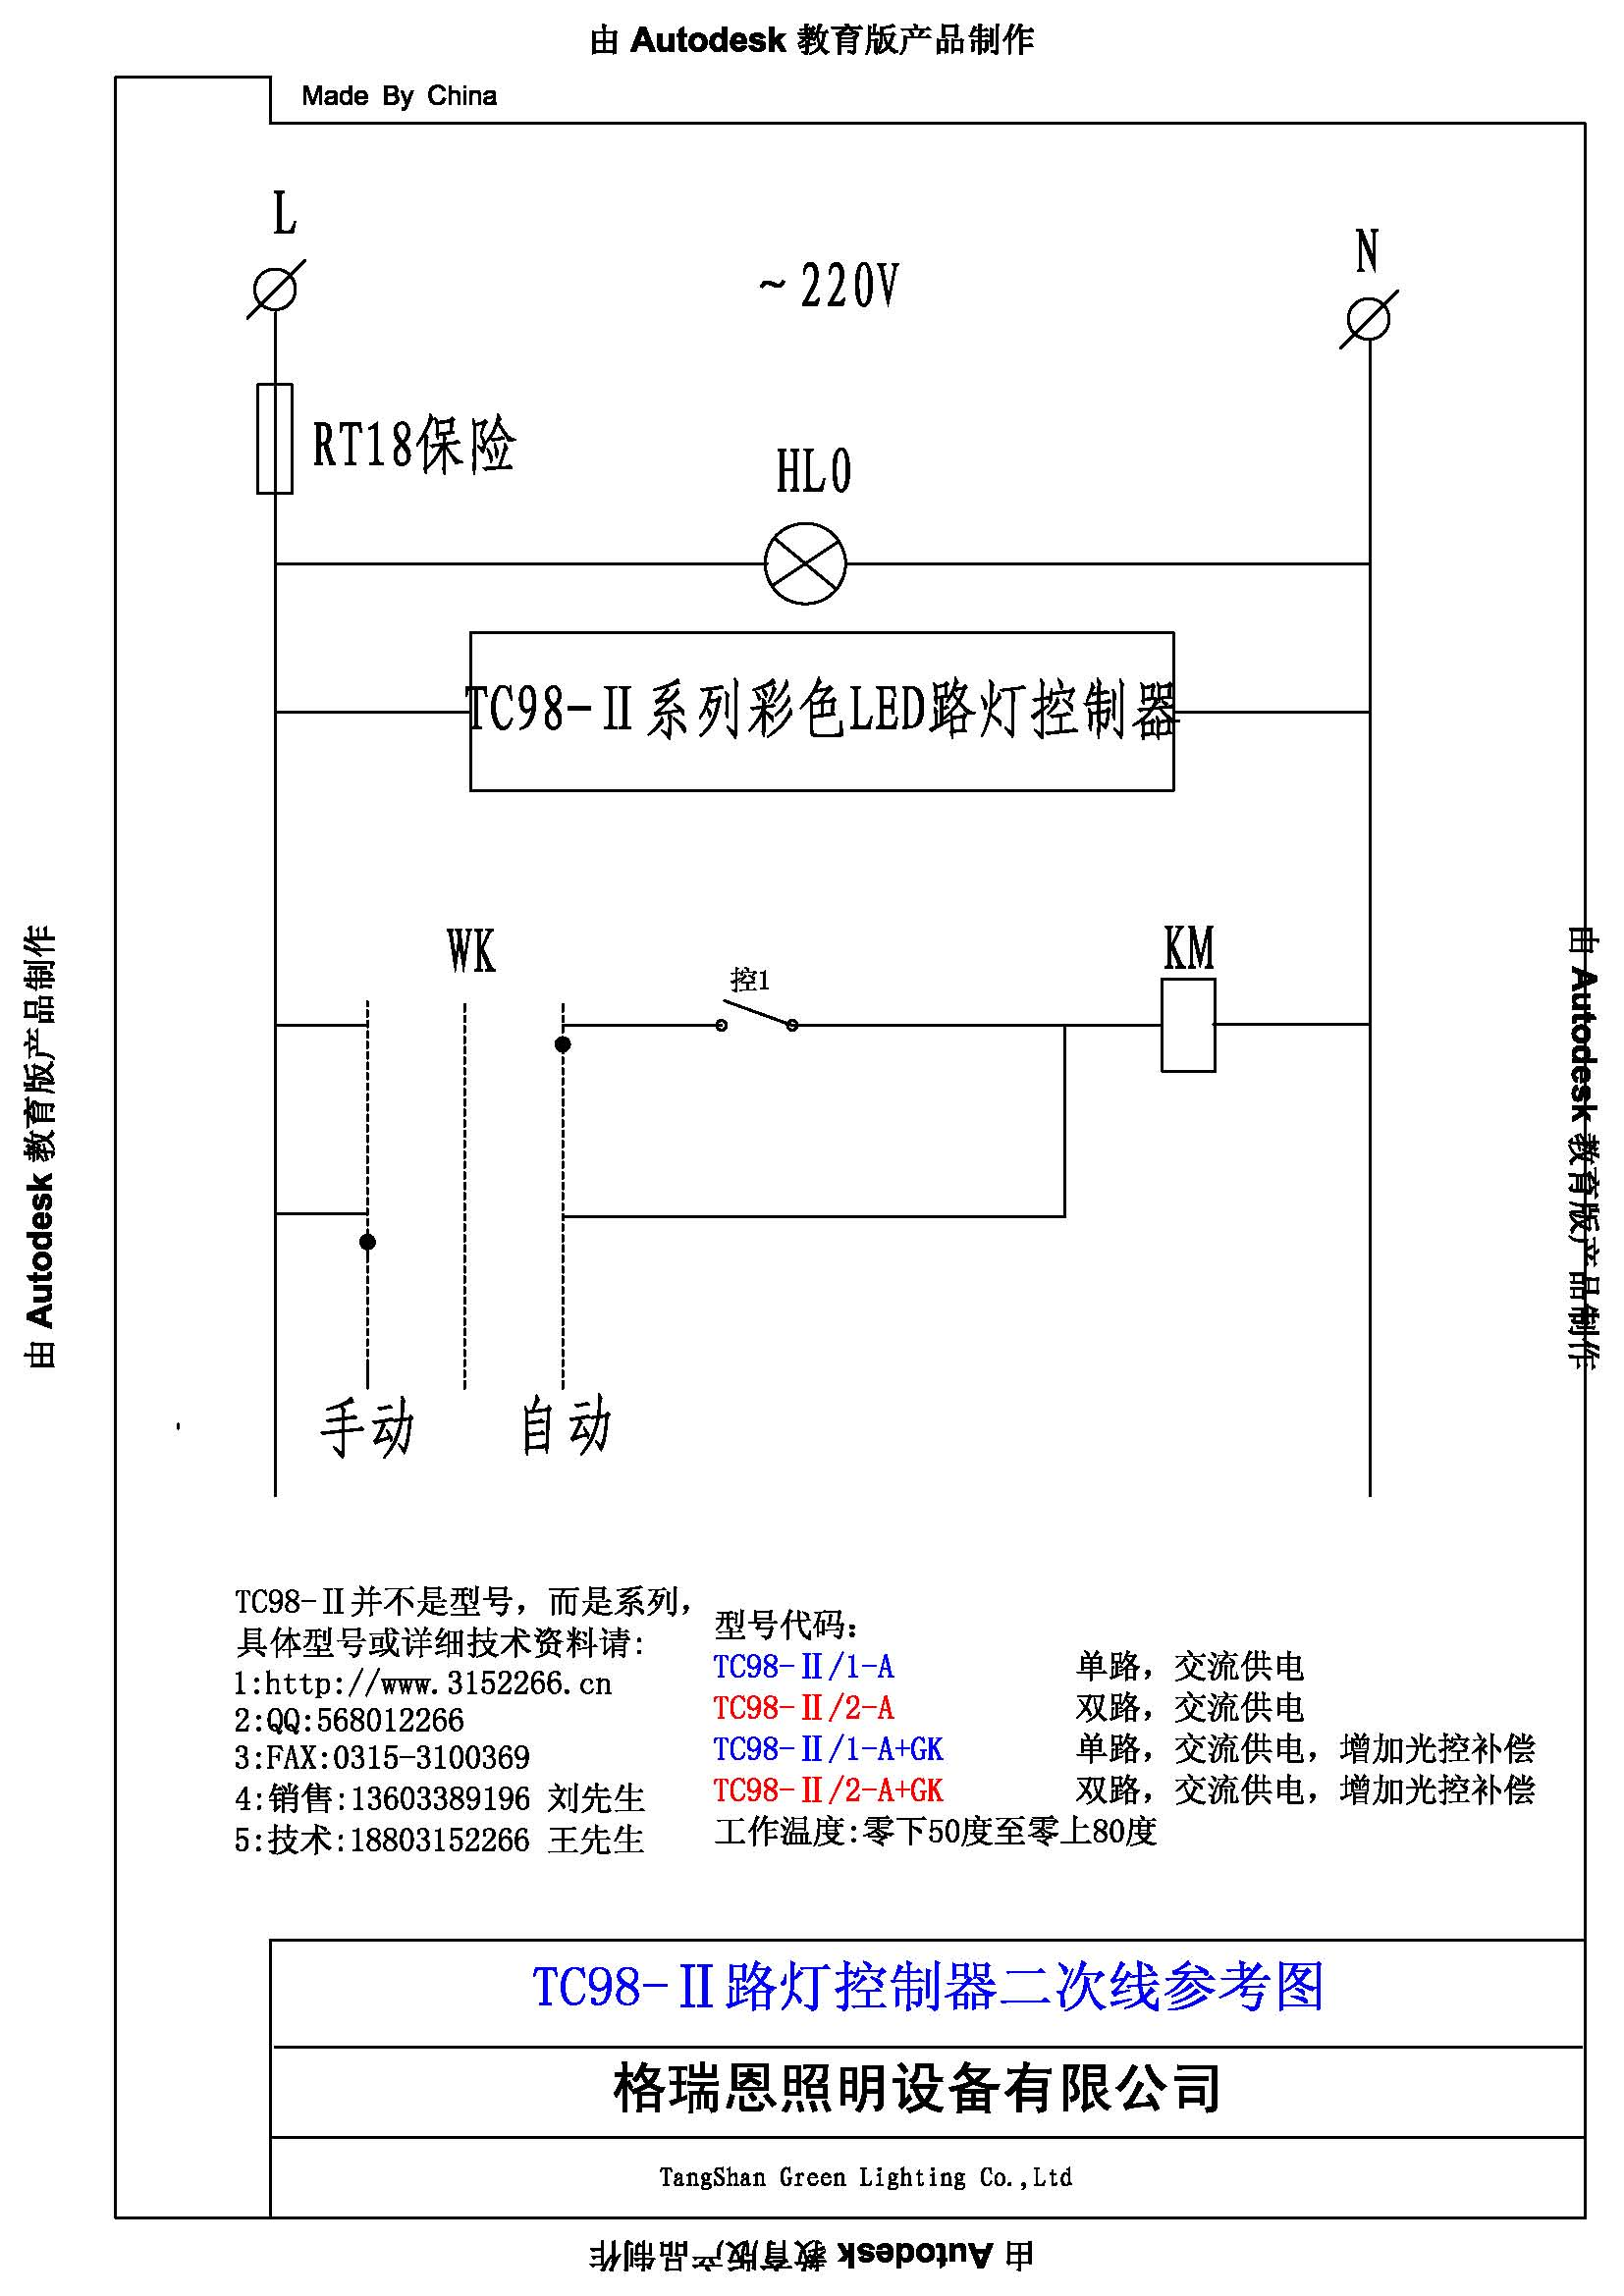 tc98-Ⅱ路灯控制器